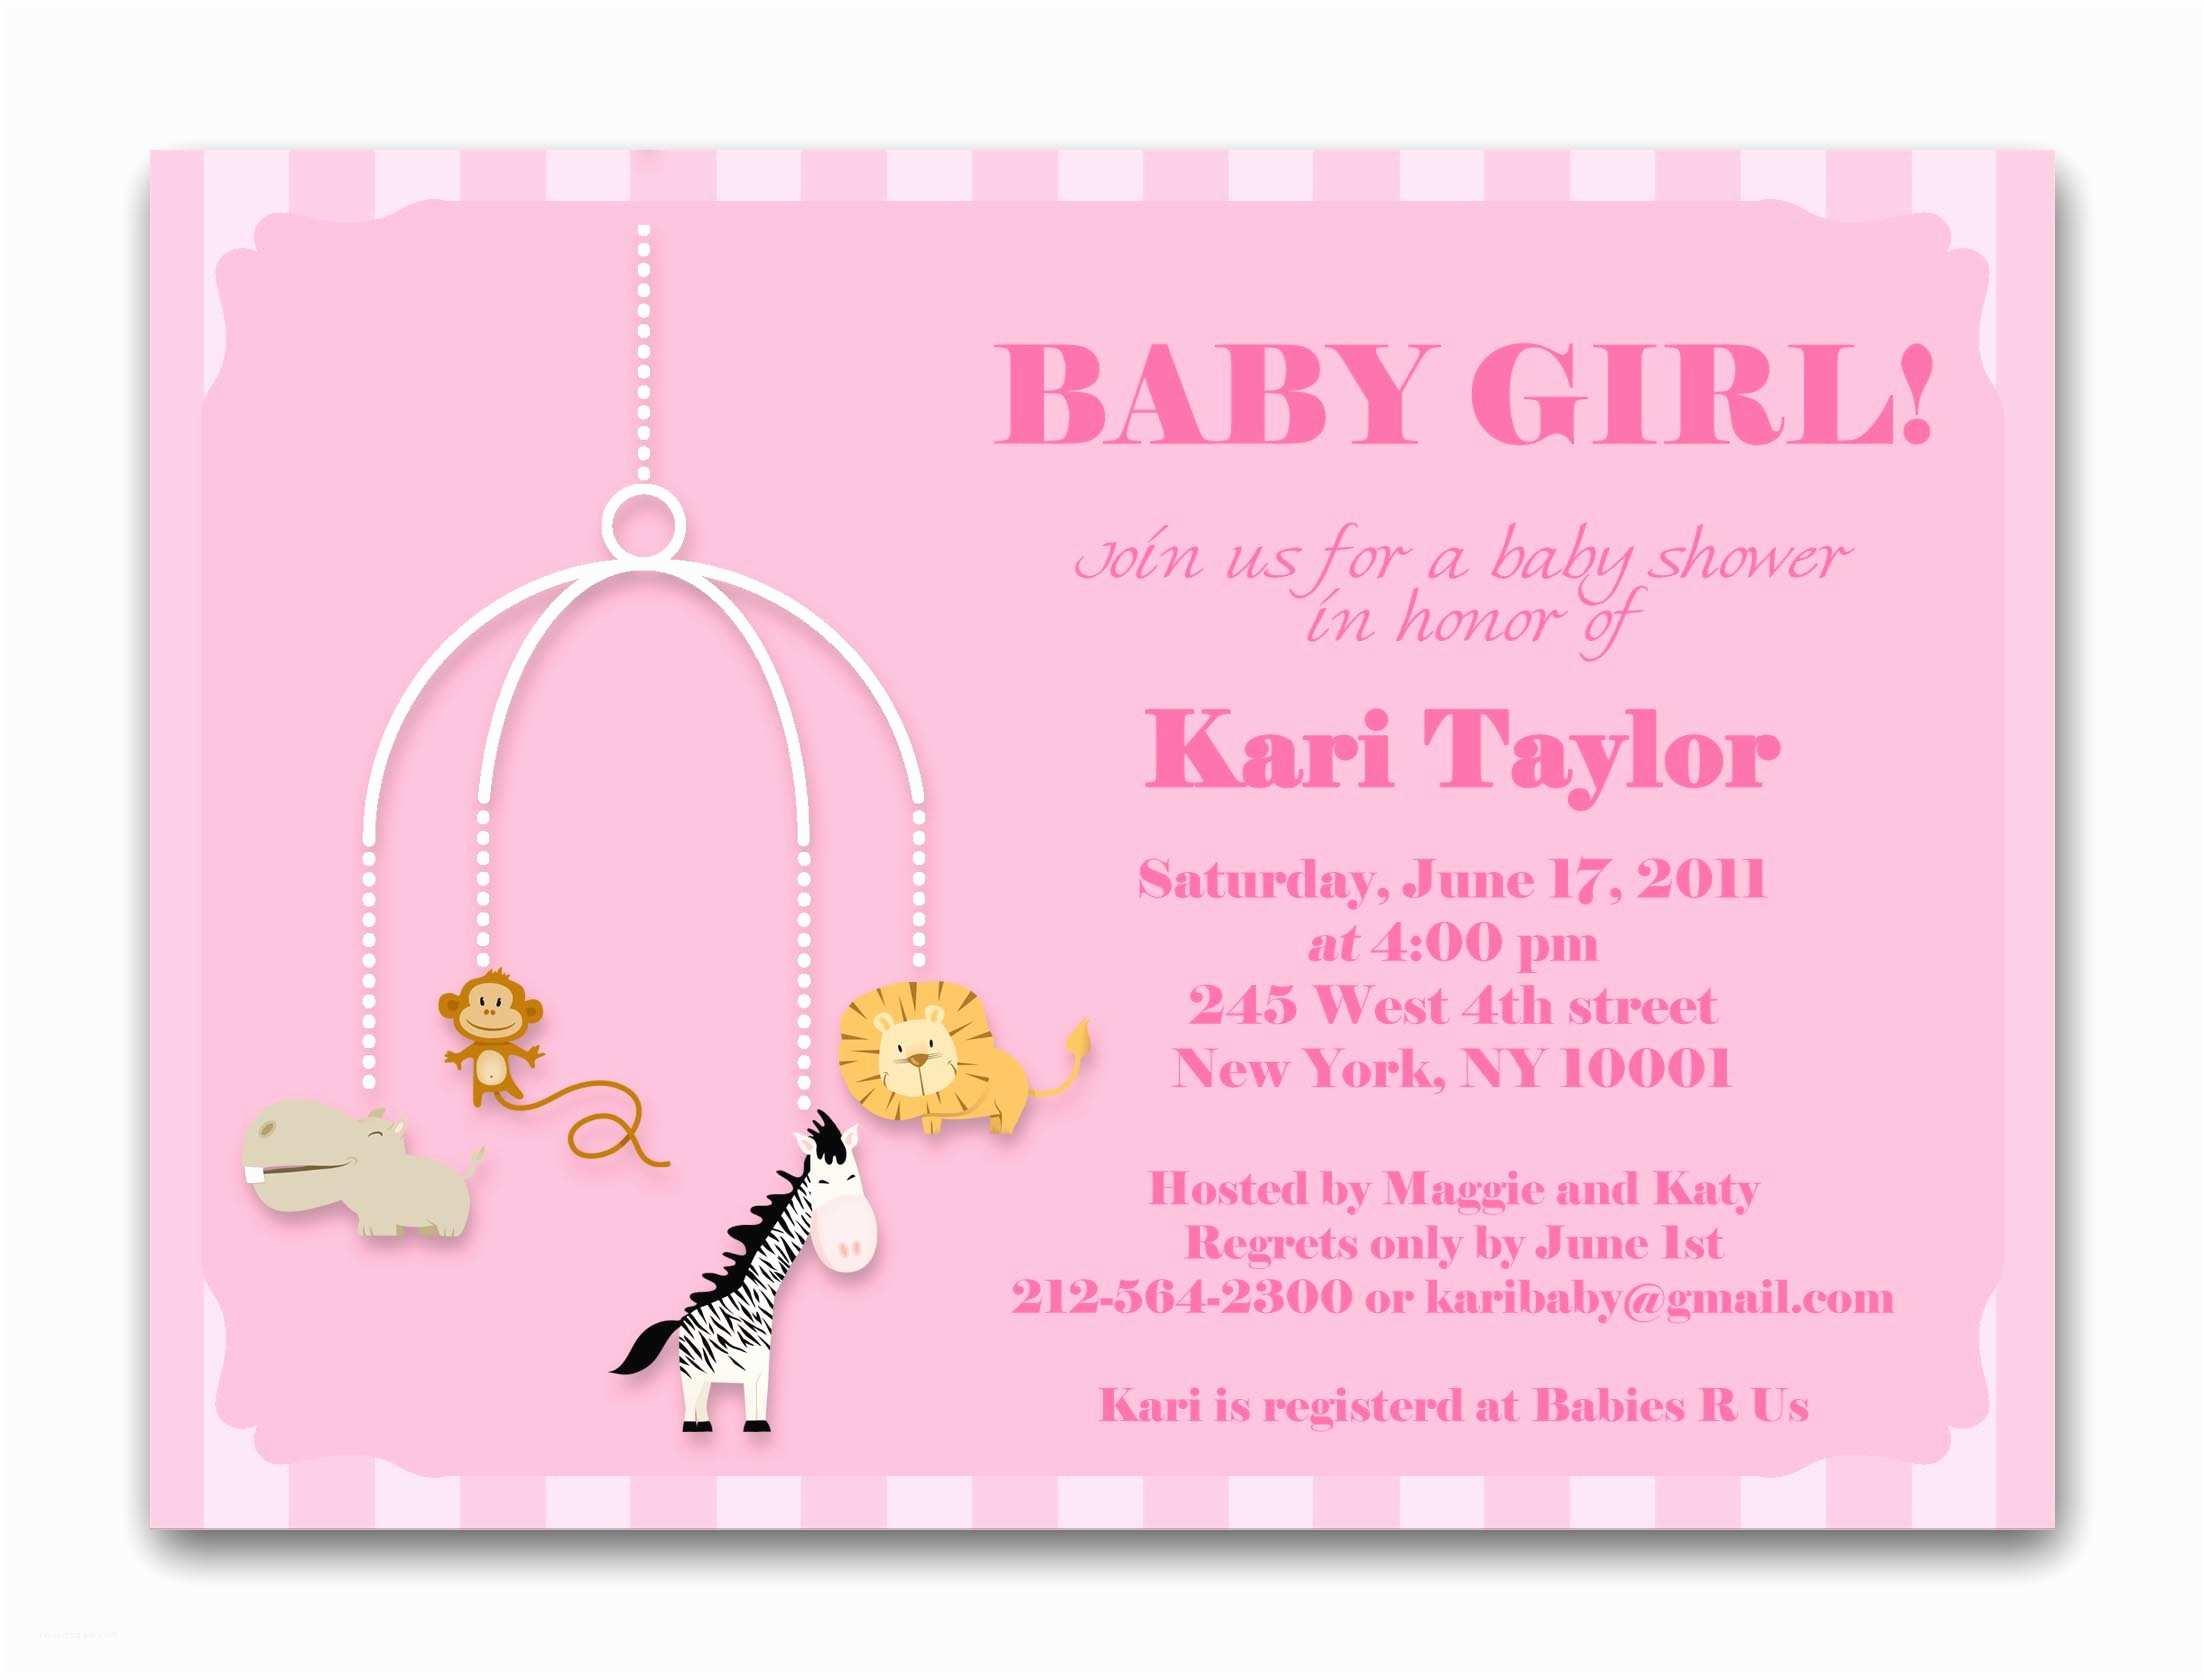 Baby Girl Baby Shower Invitations Baby Shower Invitations for Girls